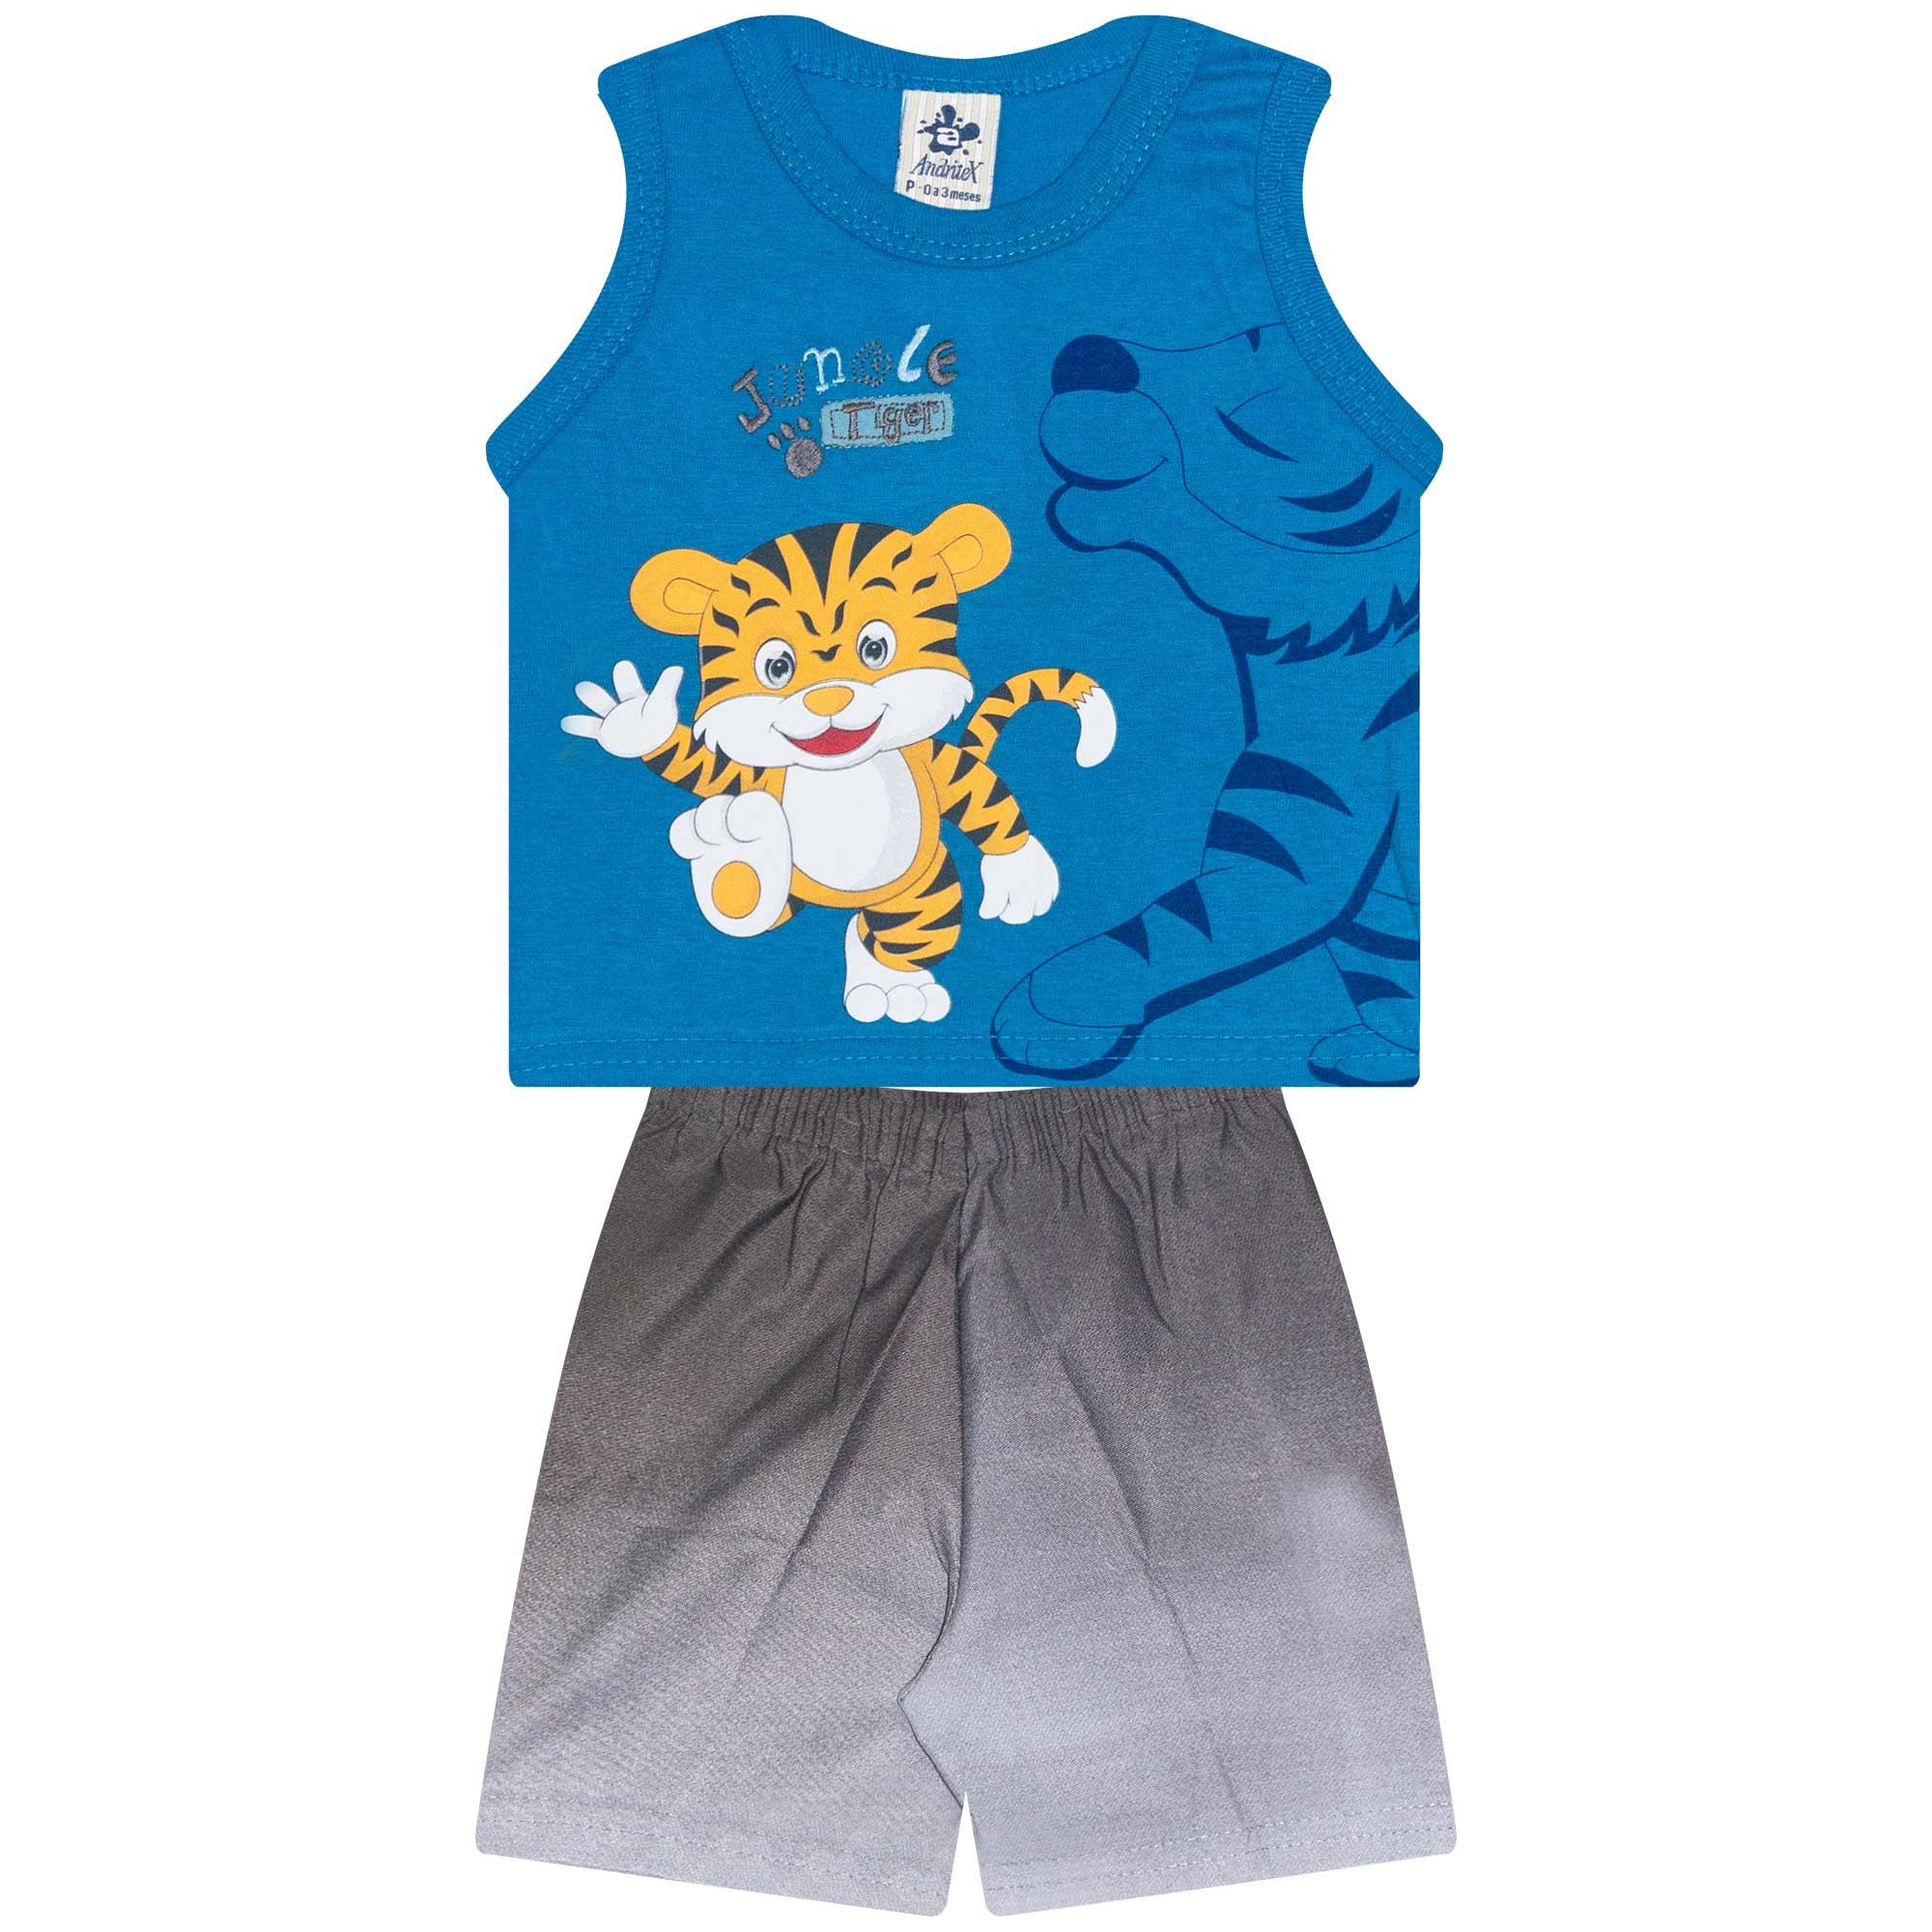 Conjunto Regata Infantil Masculino - Ref 4700  - Azul - Andritex